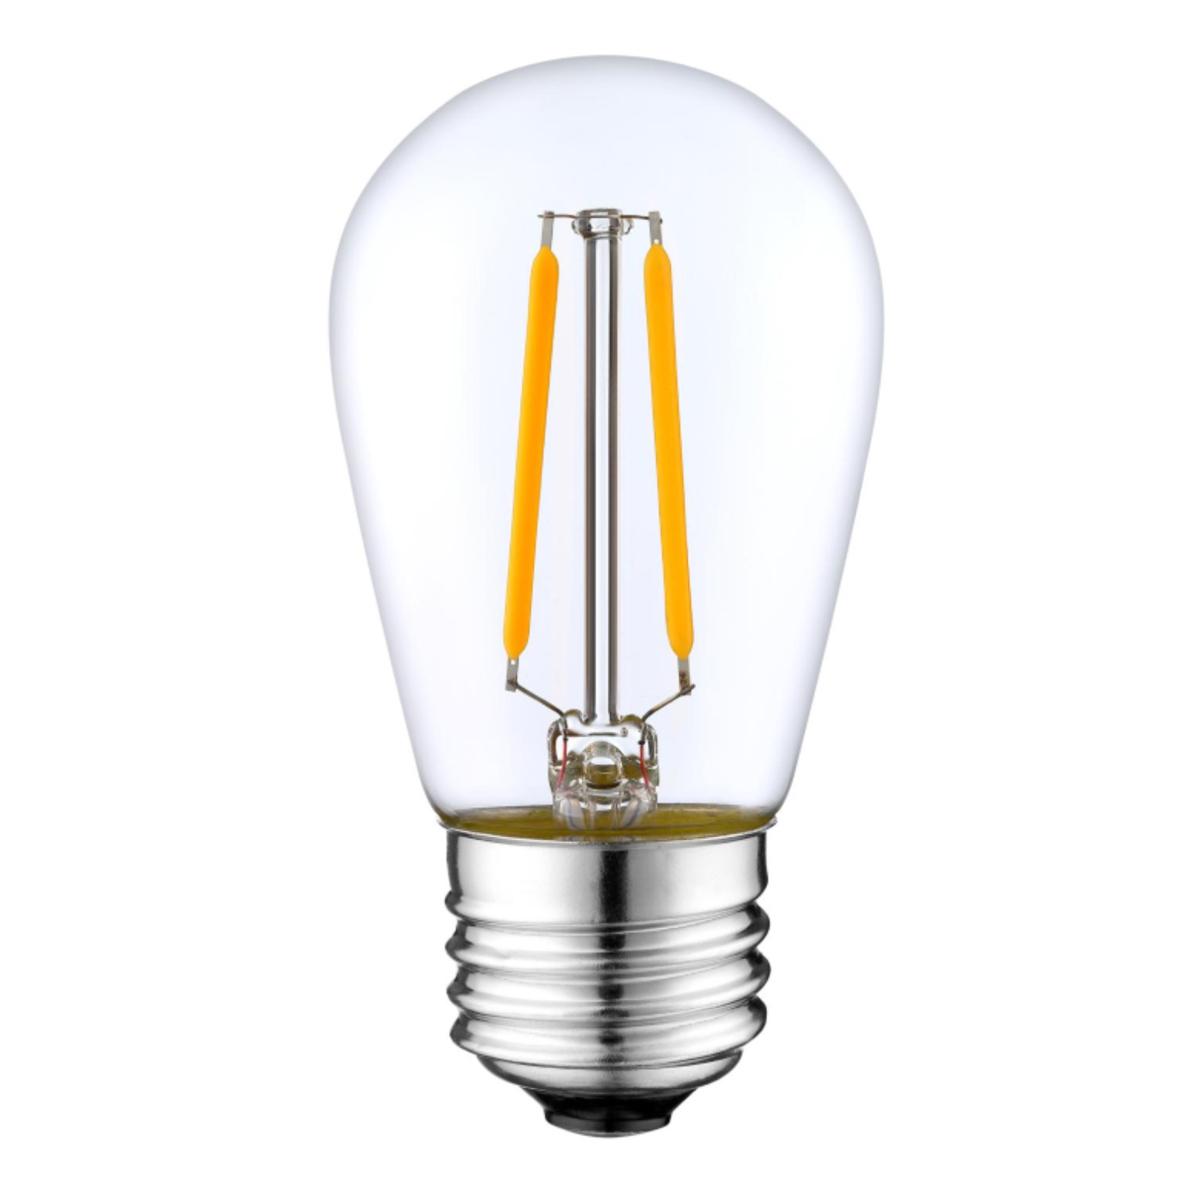 2w St45 Led Lampjlal 031 Lmp 01